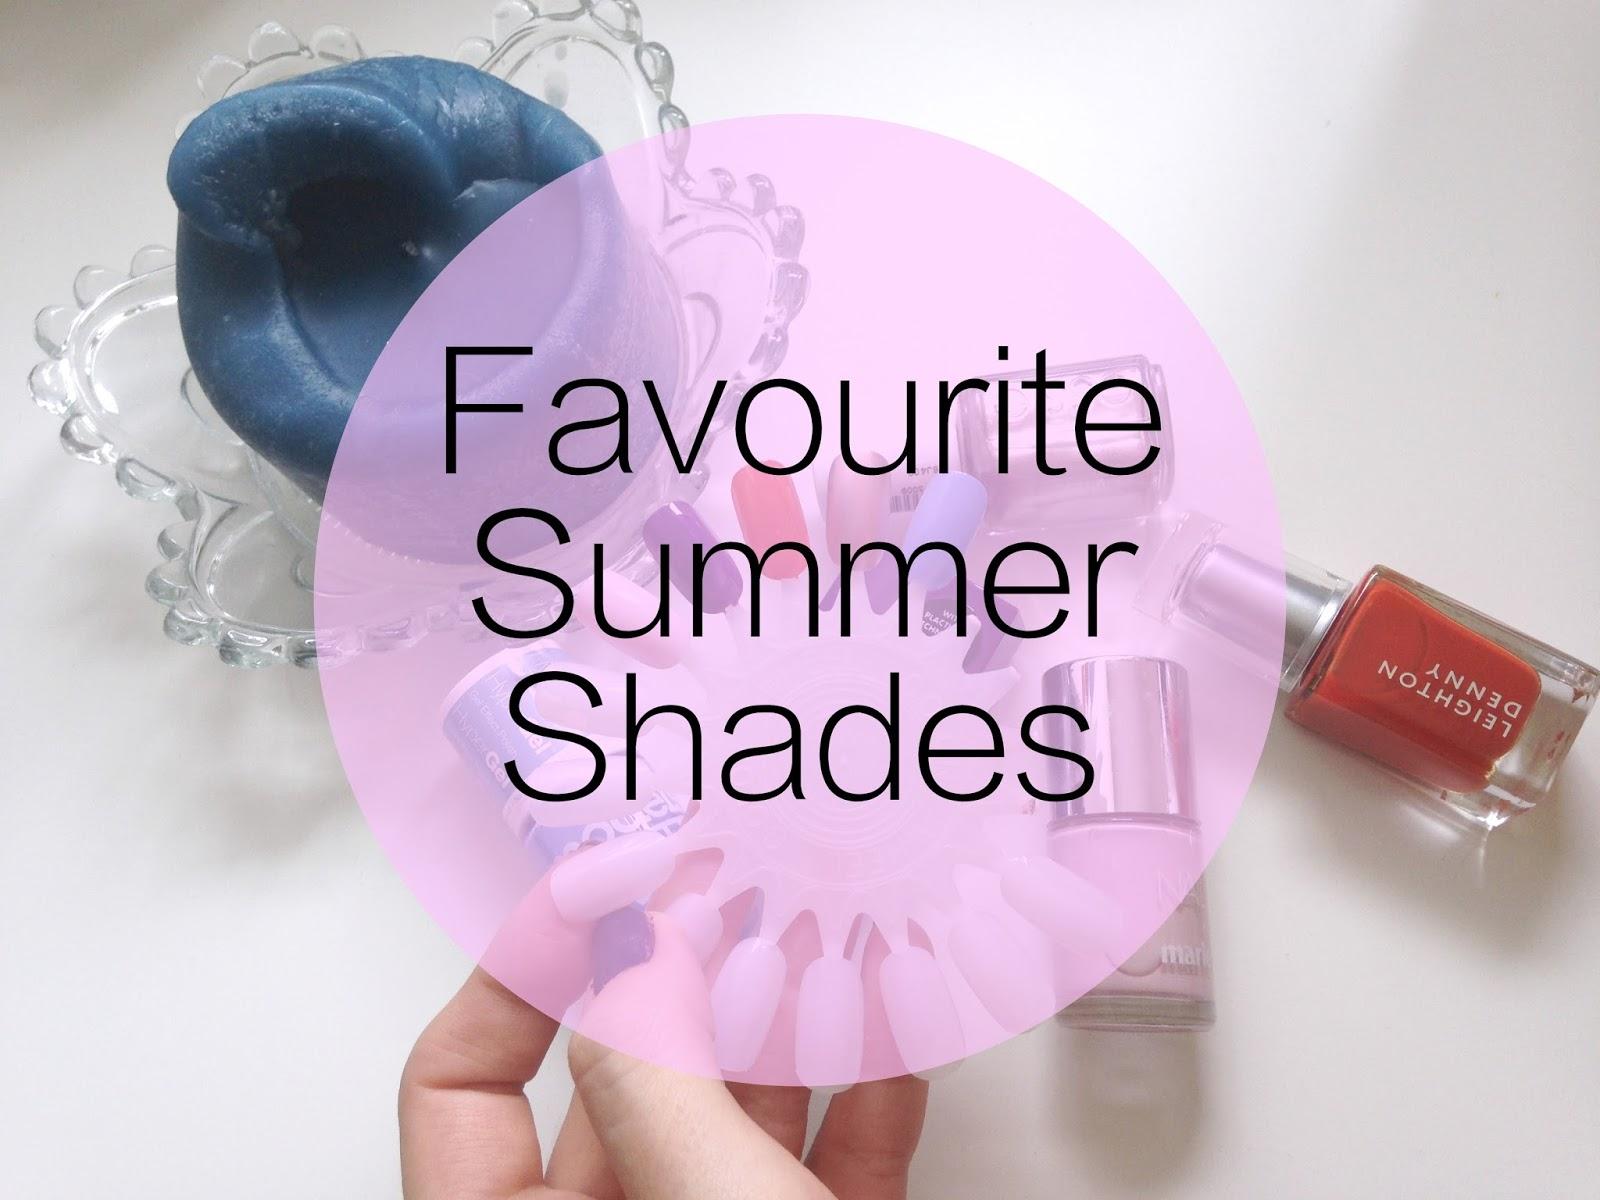 Favourite Summer Shades